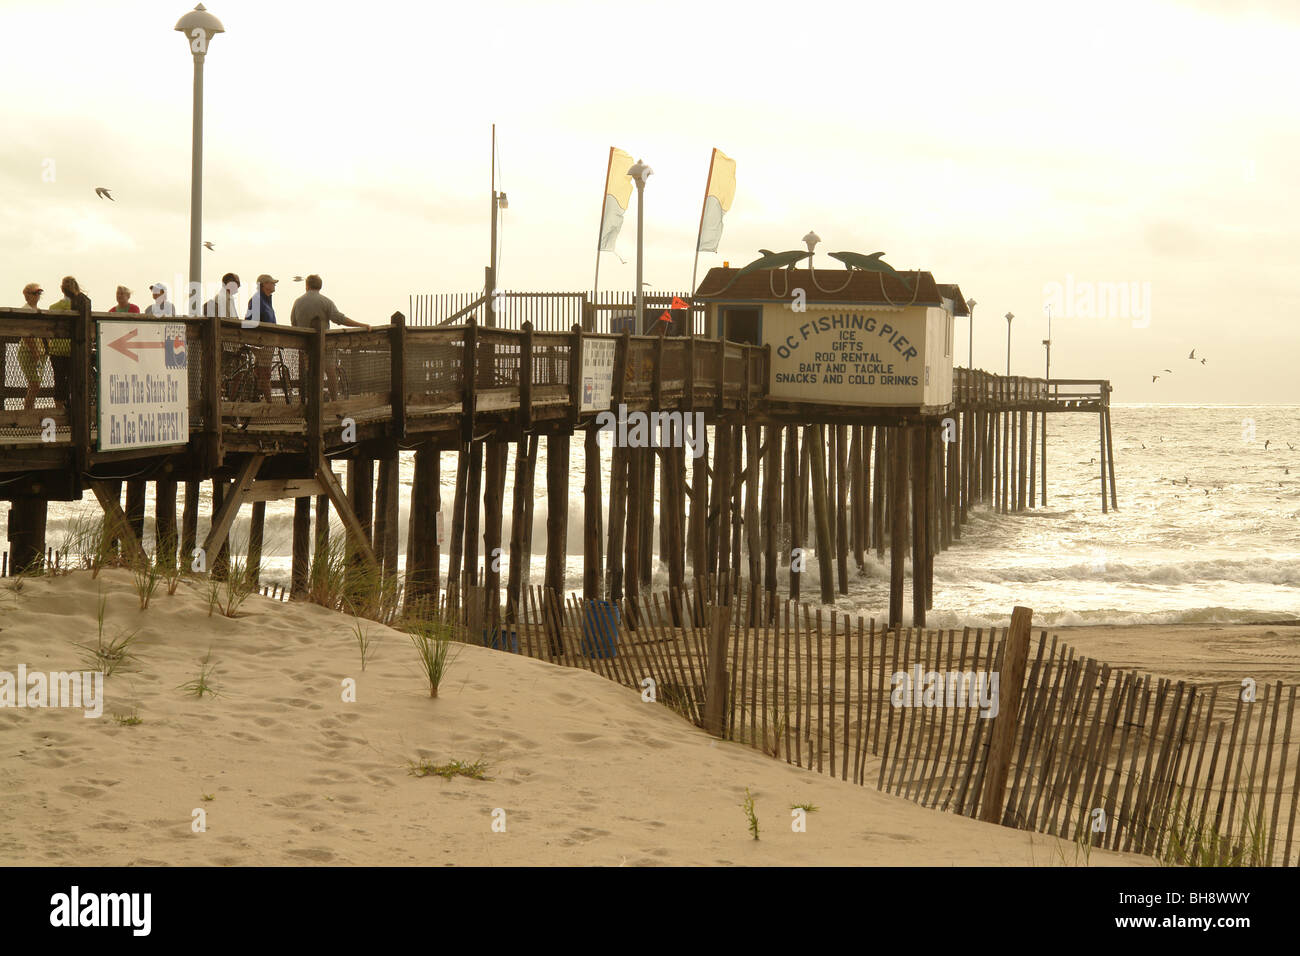 Scopes photography ocean city maryland Daily Press - Hampton Roads News, Virginia News Videos